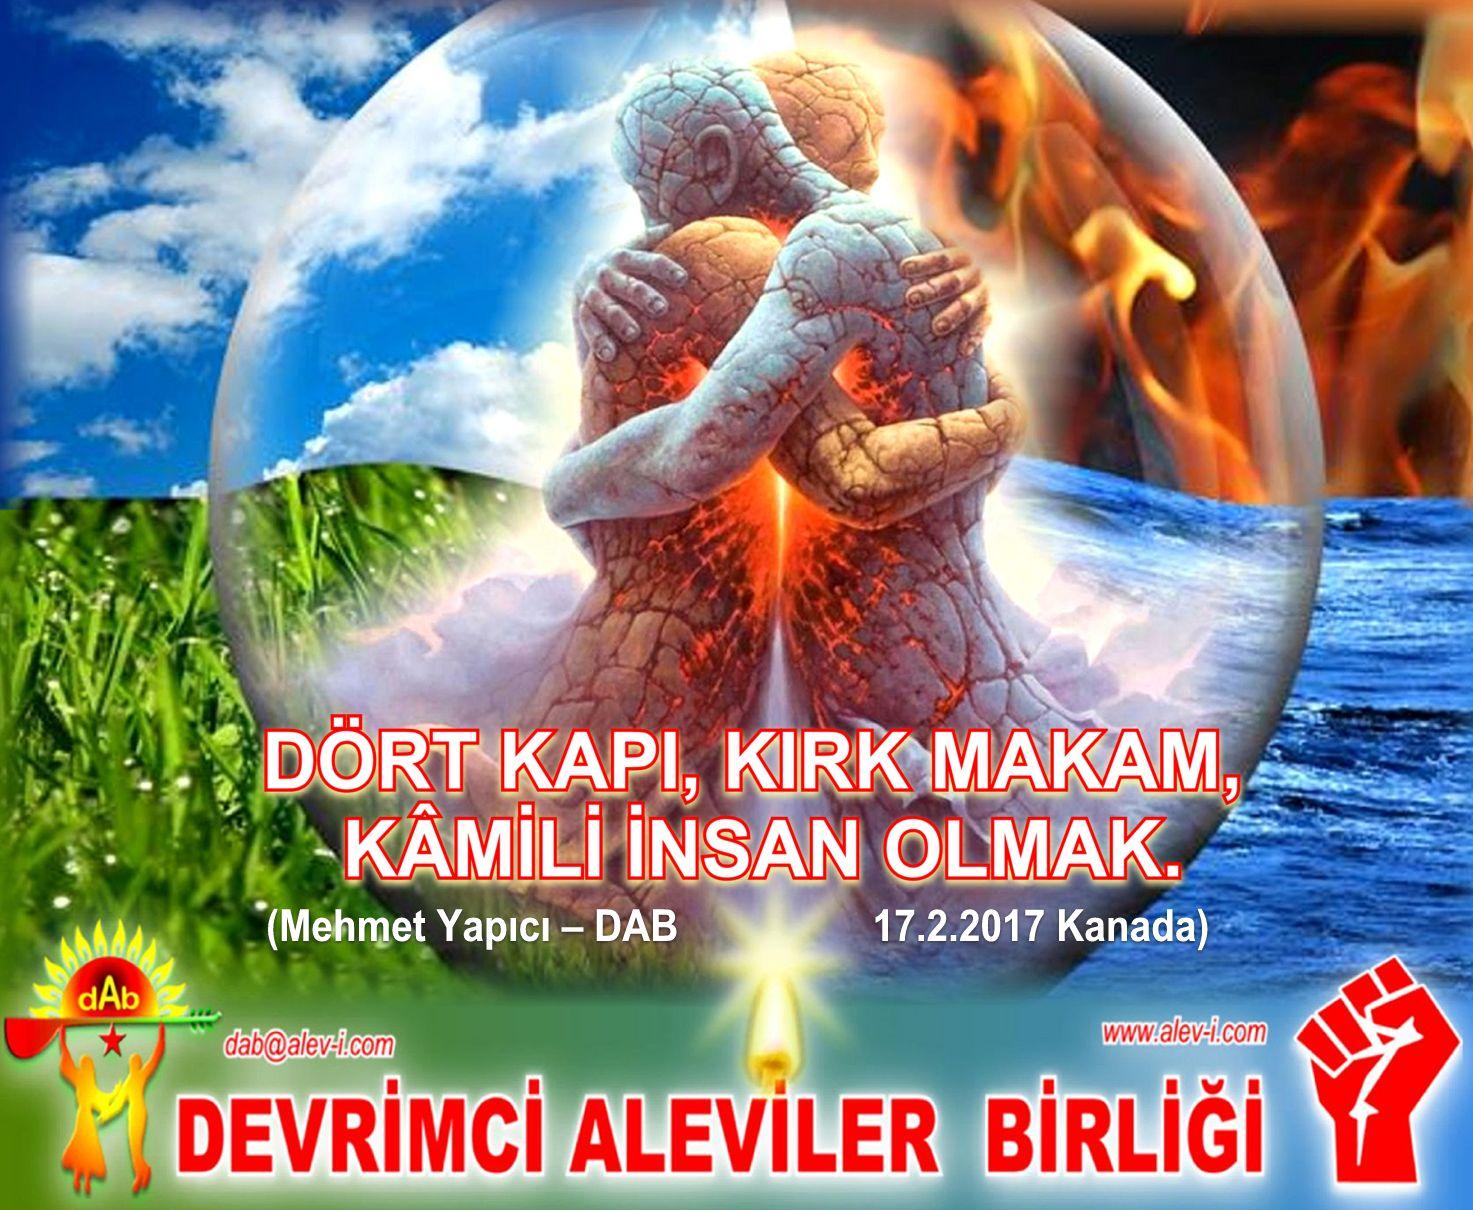 4 unsur hava su toprak can Devrimci Alevi DAB kizilbas bektasi pir sultan cem mehmet yapici dab